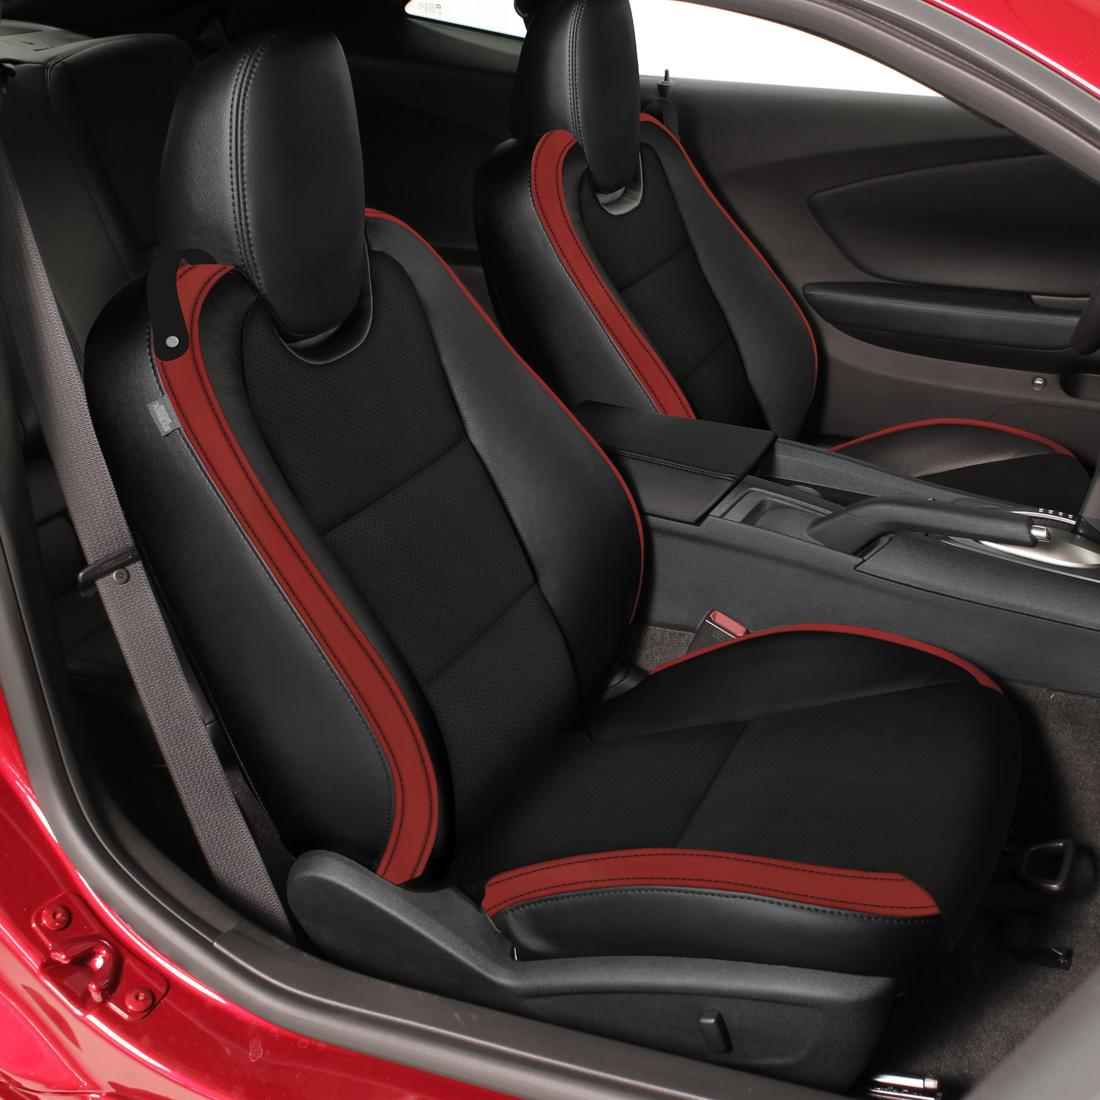 Camaro Seat Covers 2013 - Velcromag